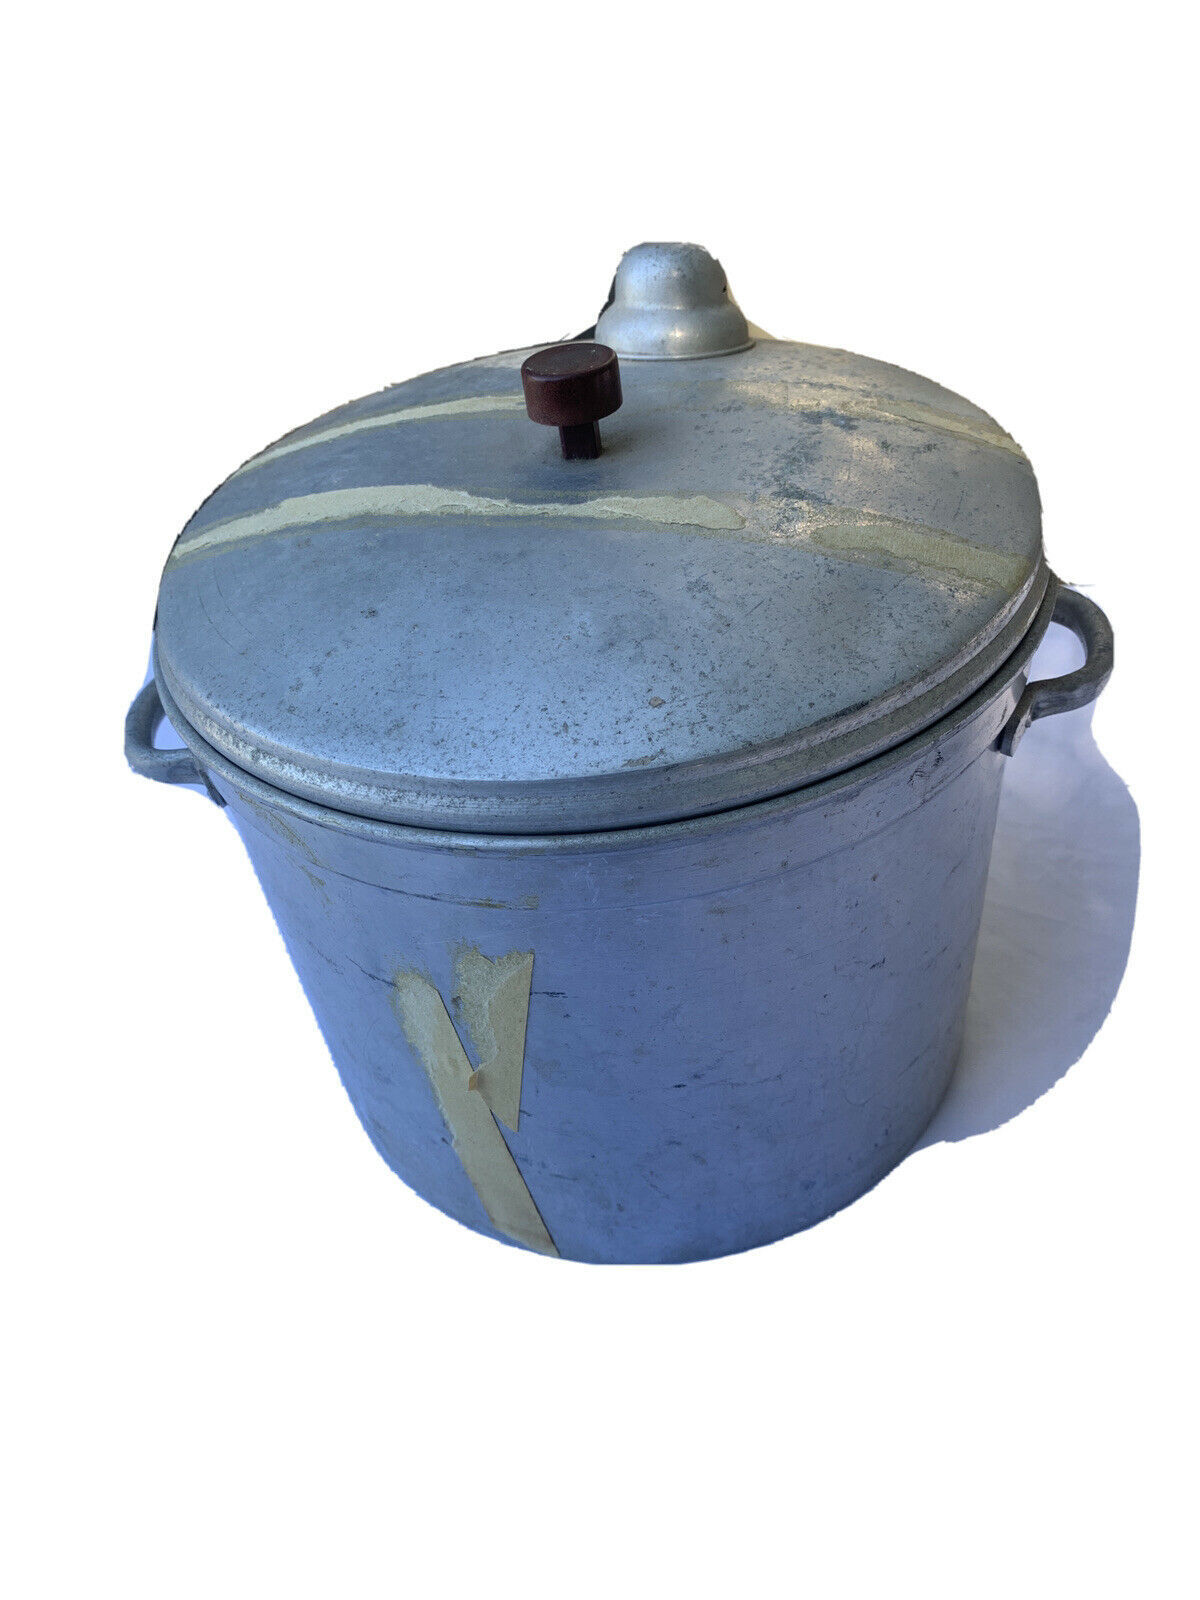 Vintage Evenflo Glass Baby Bottle Sterilizer Bath Pot Nursery Milk - $55.99